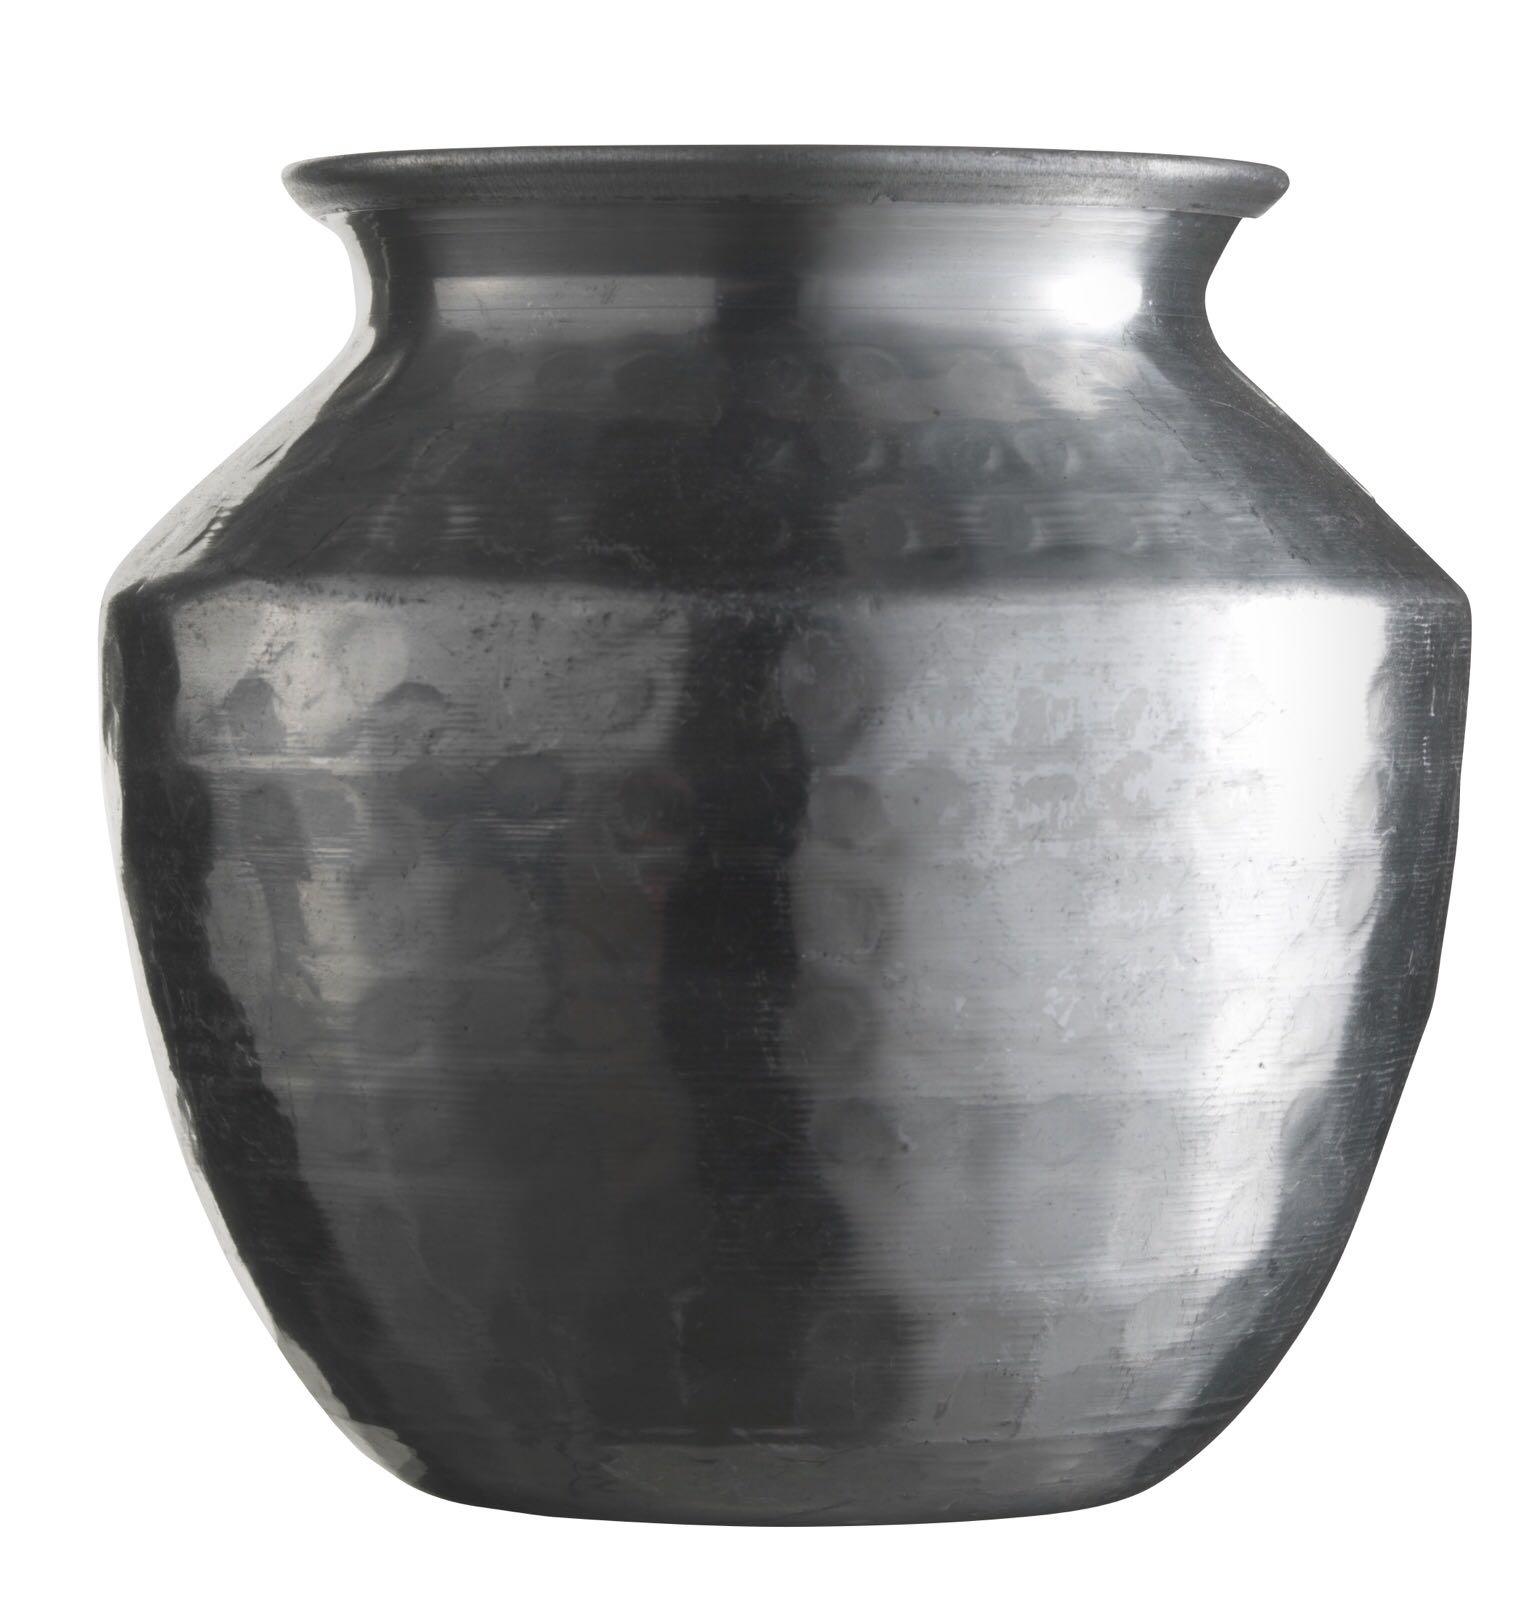 Vase aus Alu, gehämmert